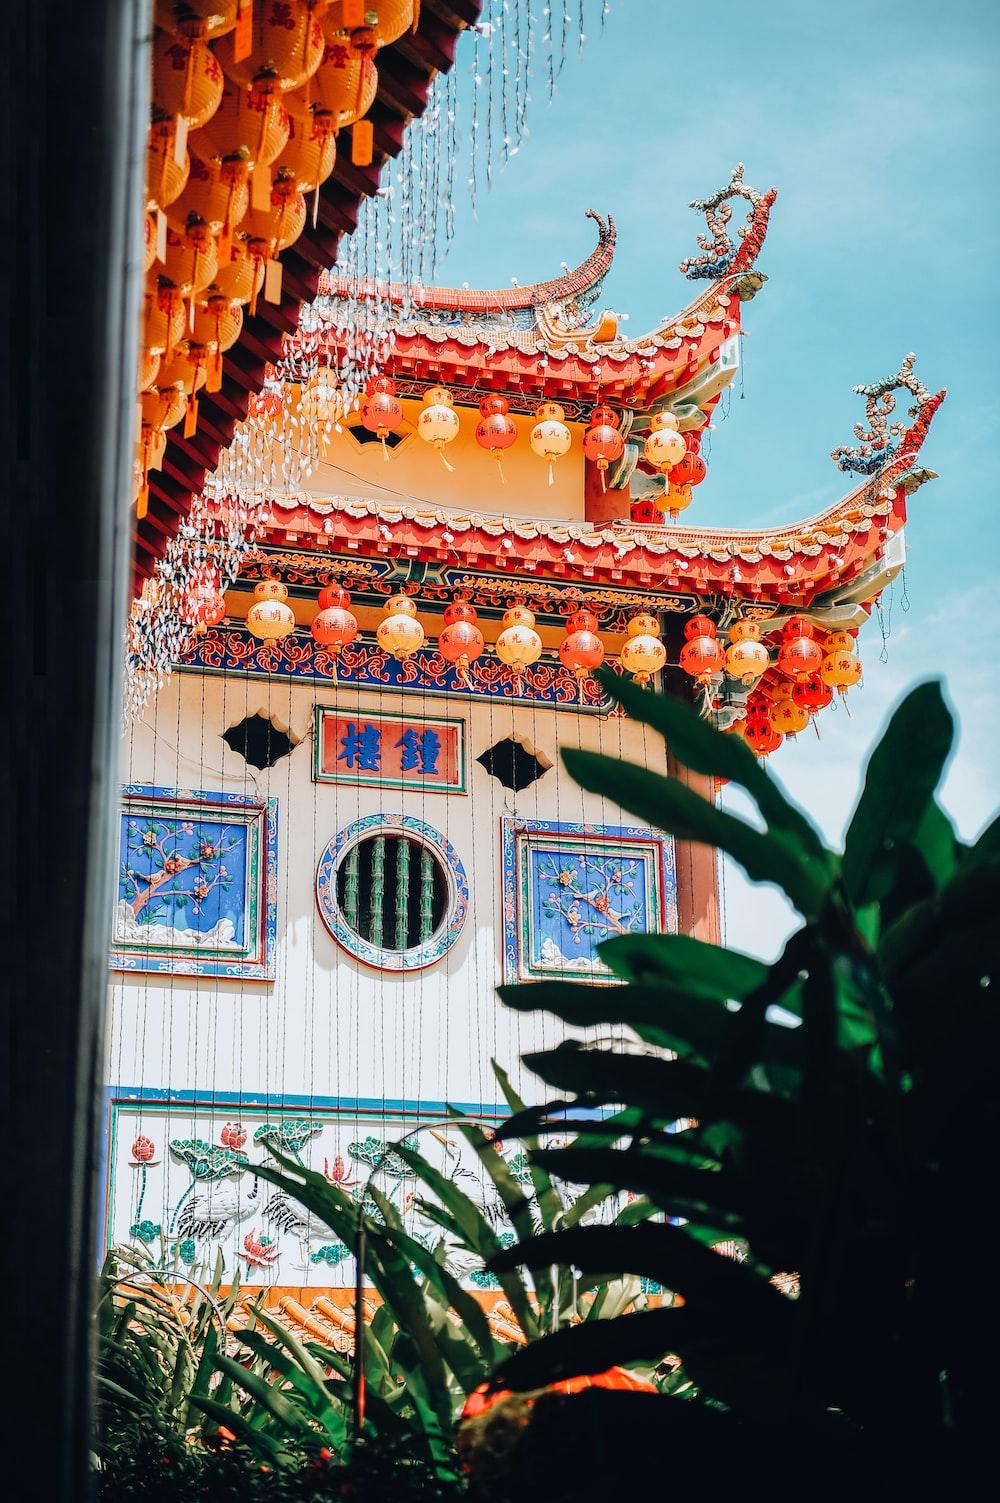 red and yellow chinese lantern